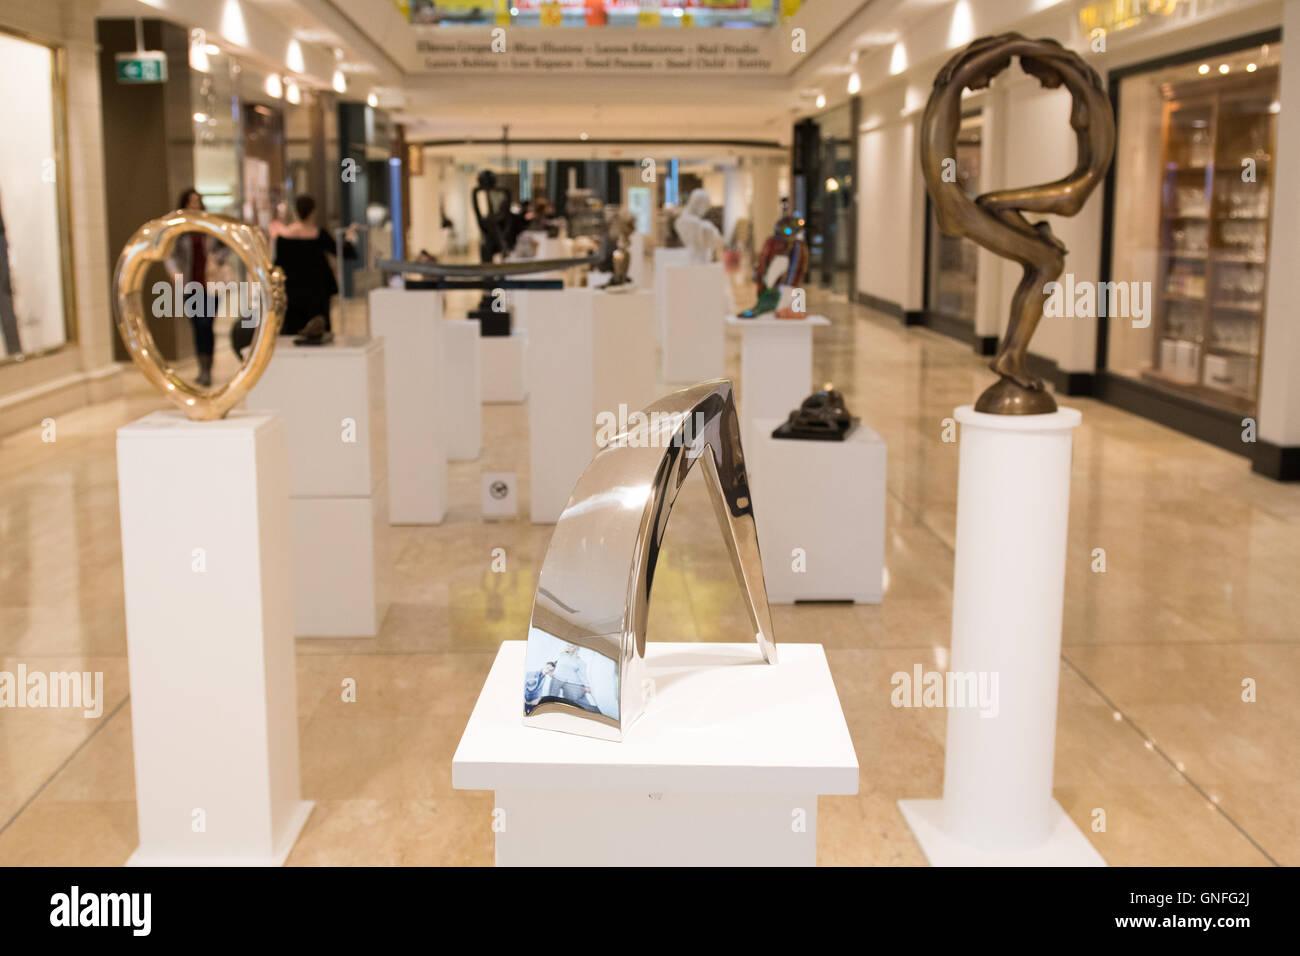 Exhibition Displays Australia : Sydney australia. 31st august 2016. form art sculpture exhibition